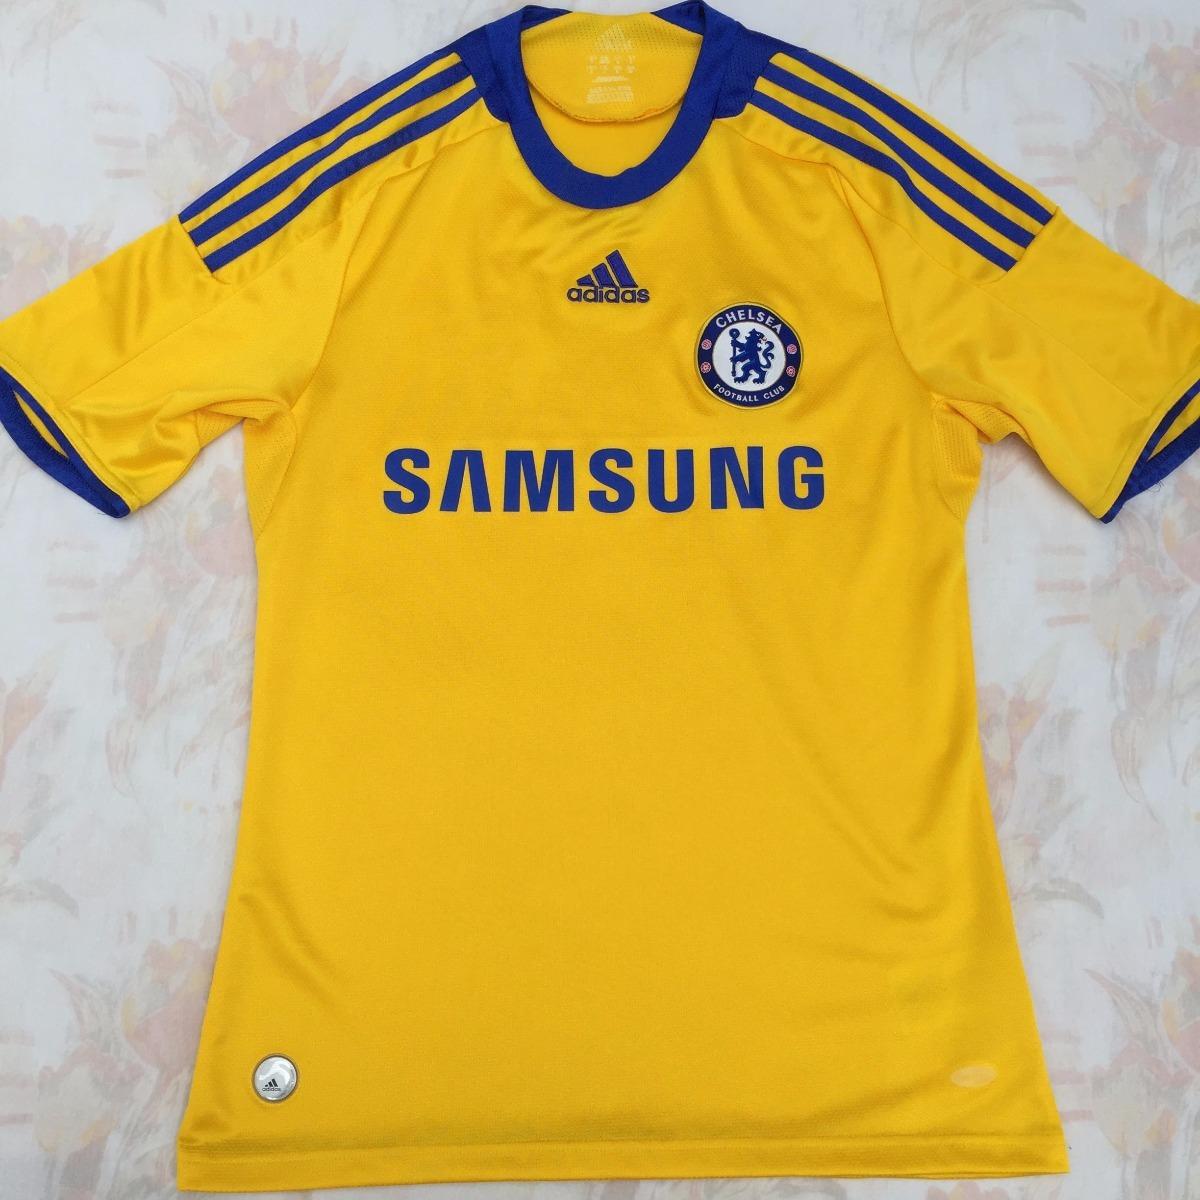 b5353b2aba74a 656118 Camisa adidas Chelsea Third 08 09 P Amarela Fn1608 - R  499 ...